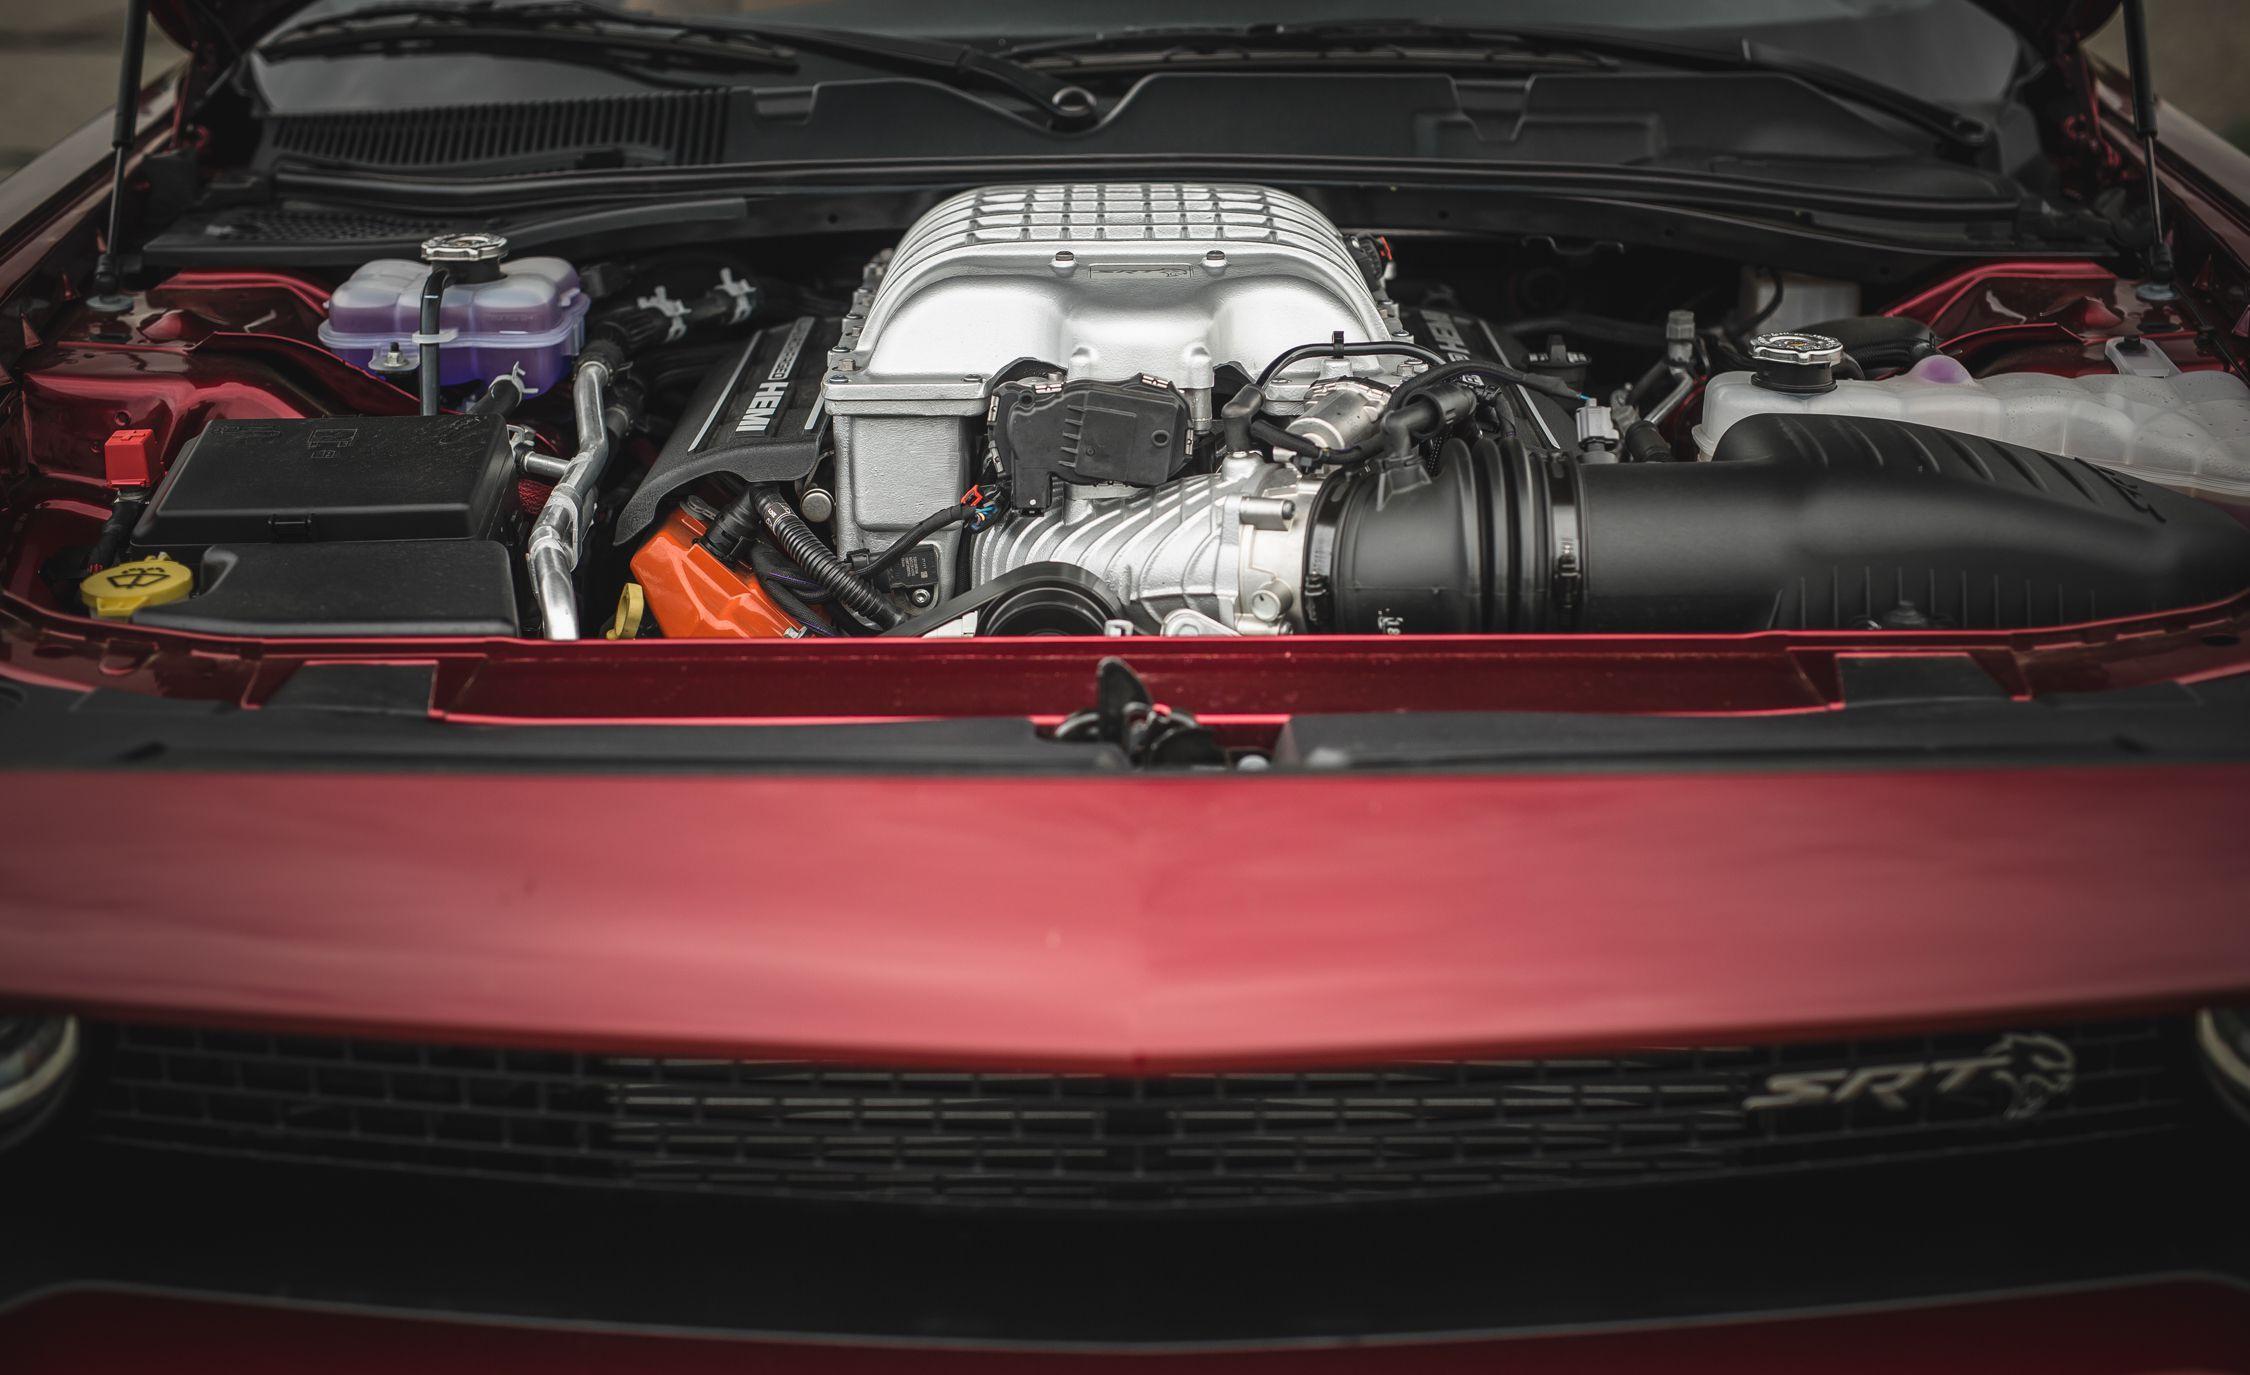 2018 Dodge Challenger Srt Hellcat Widebody Color Octane Red